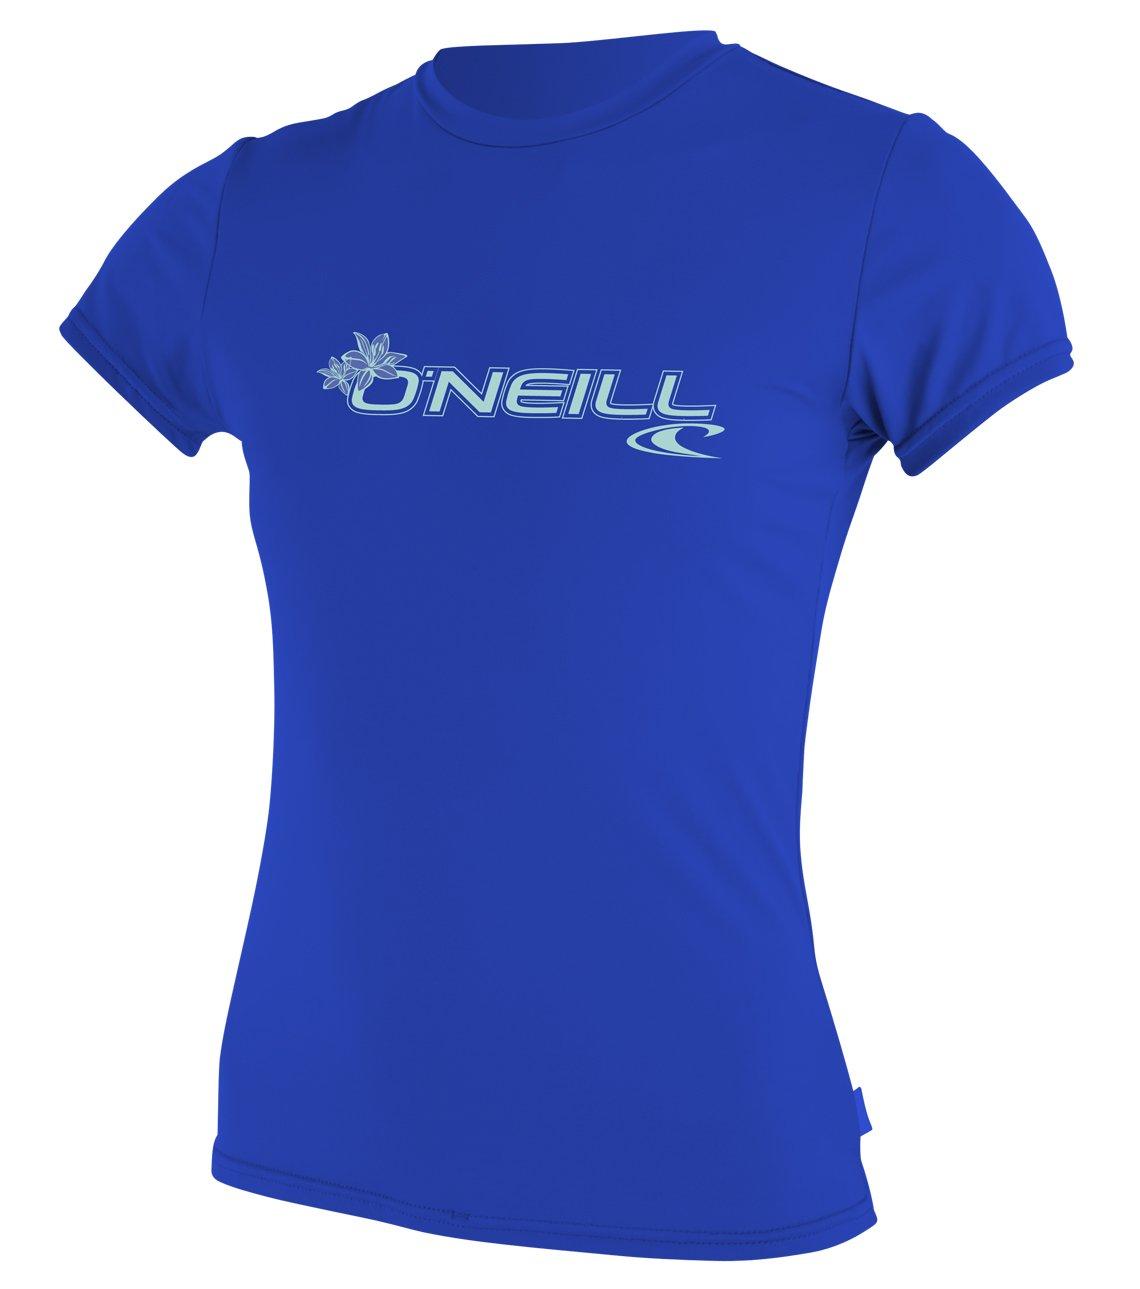 O'Neill  Women's Basic Skins Upf 50+ Short Sleeve Sun Shirt, Tahitian Blue, X-Small